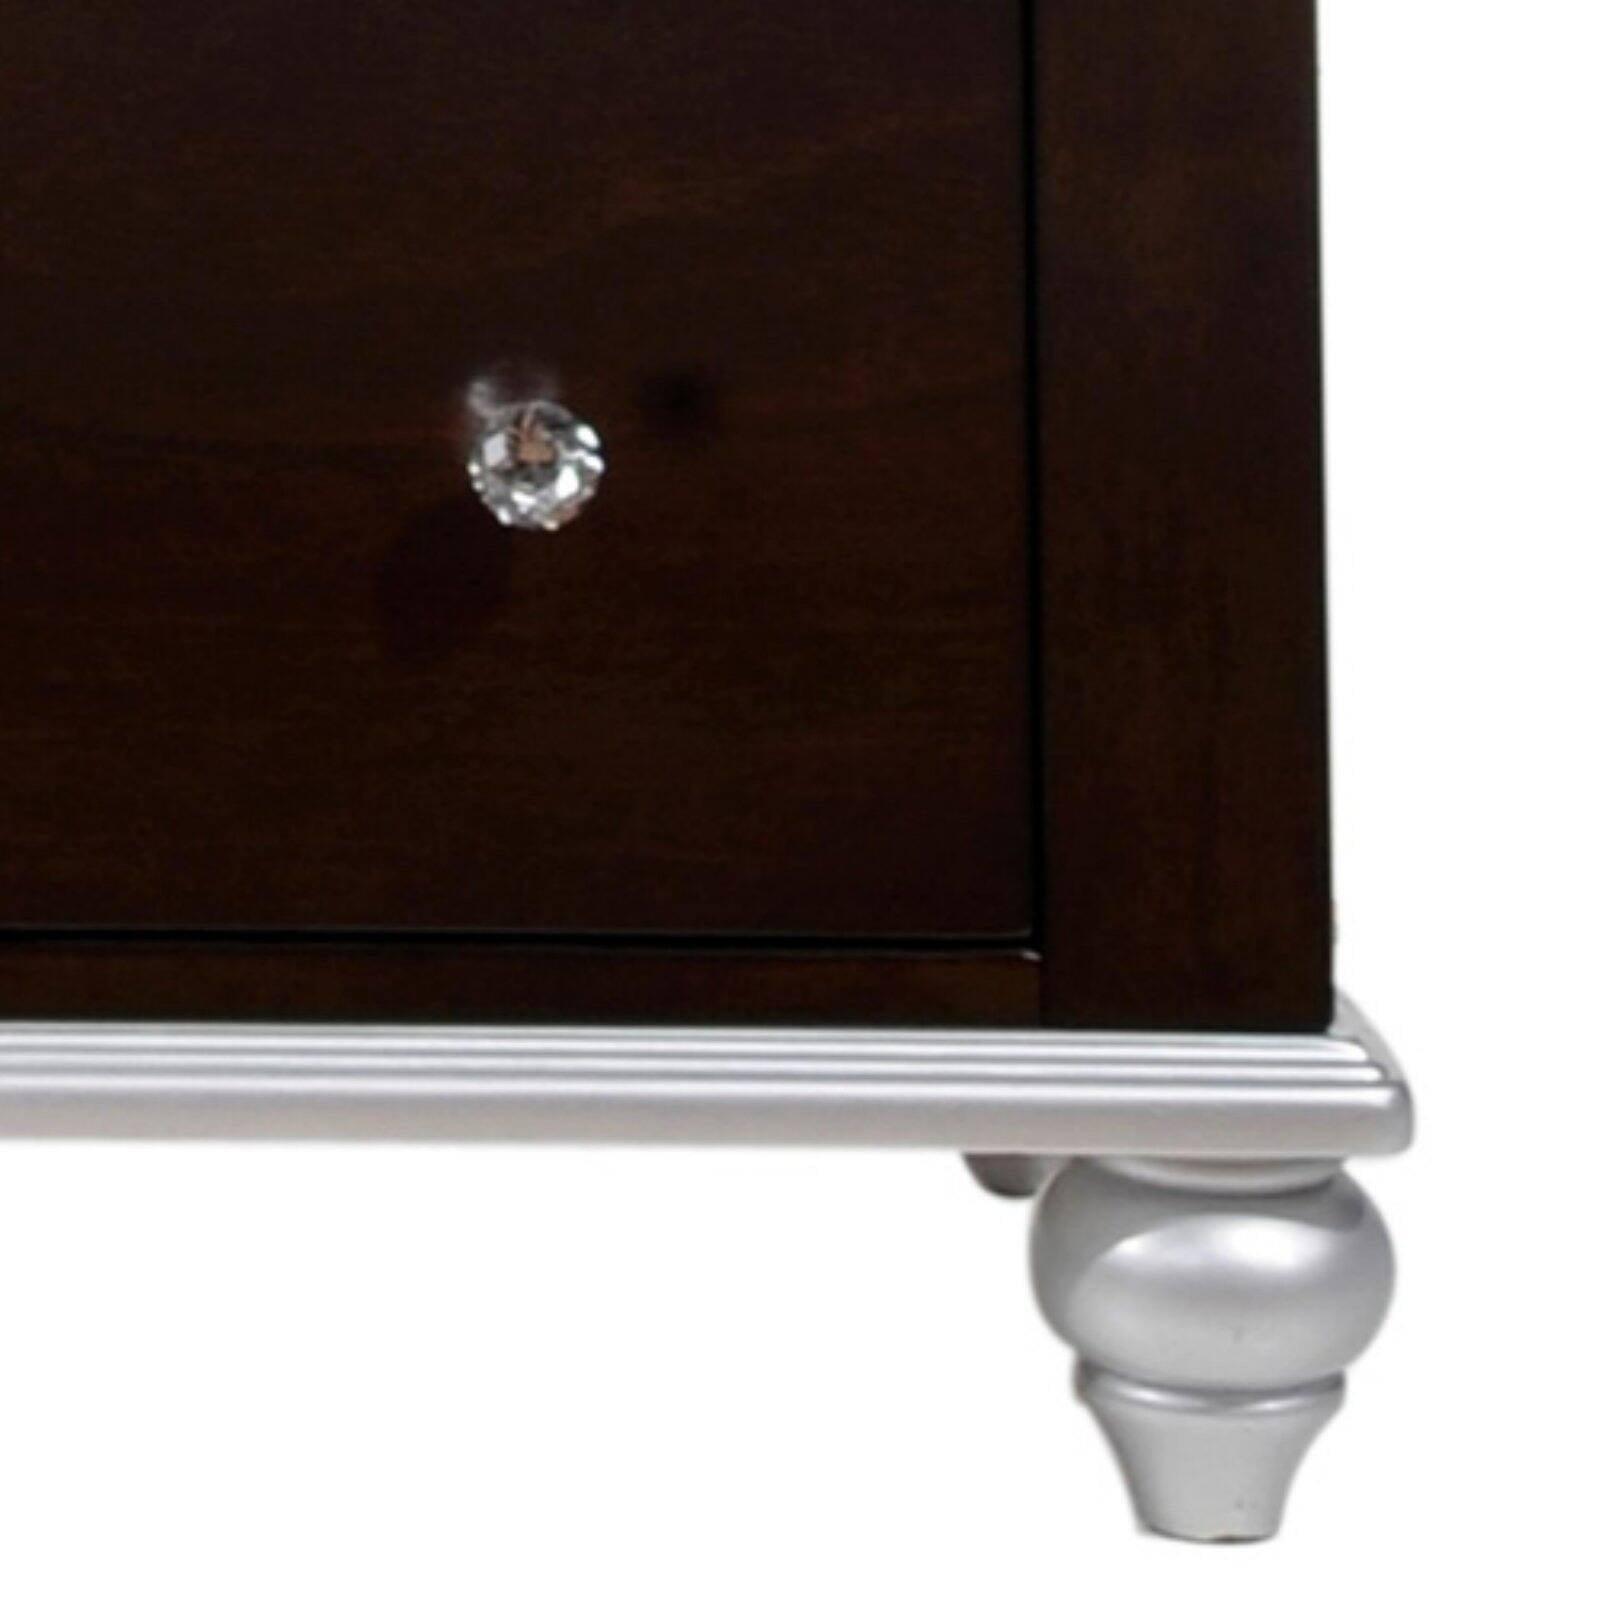 Picket House Furnishings Alli 3 Drawer Nightstand in Walnut